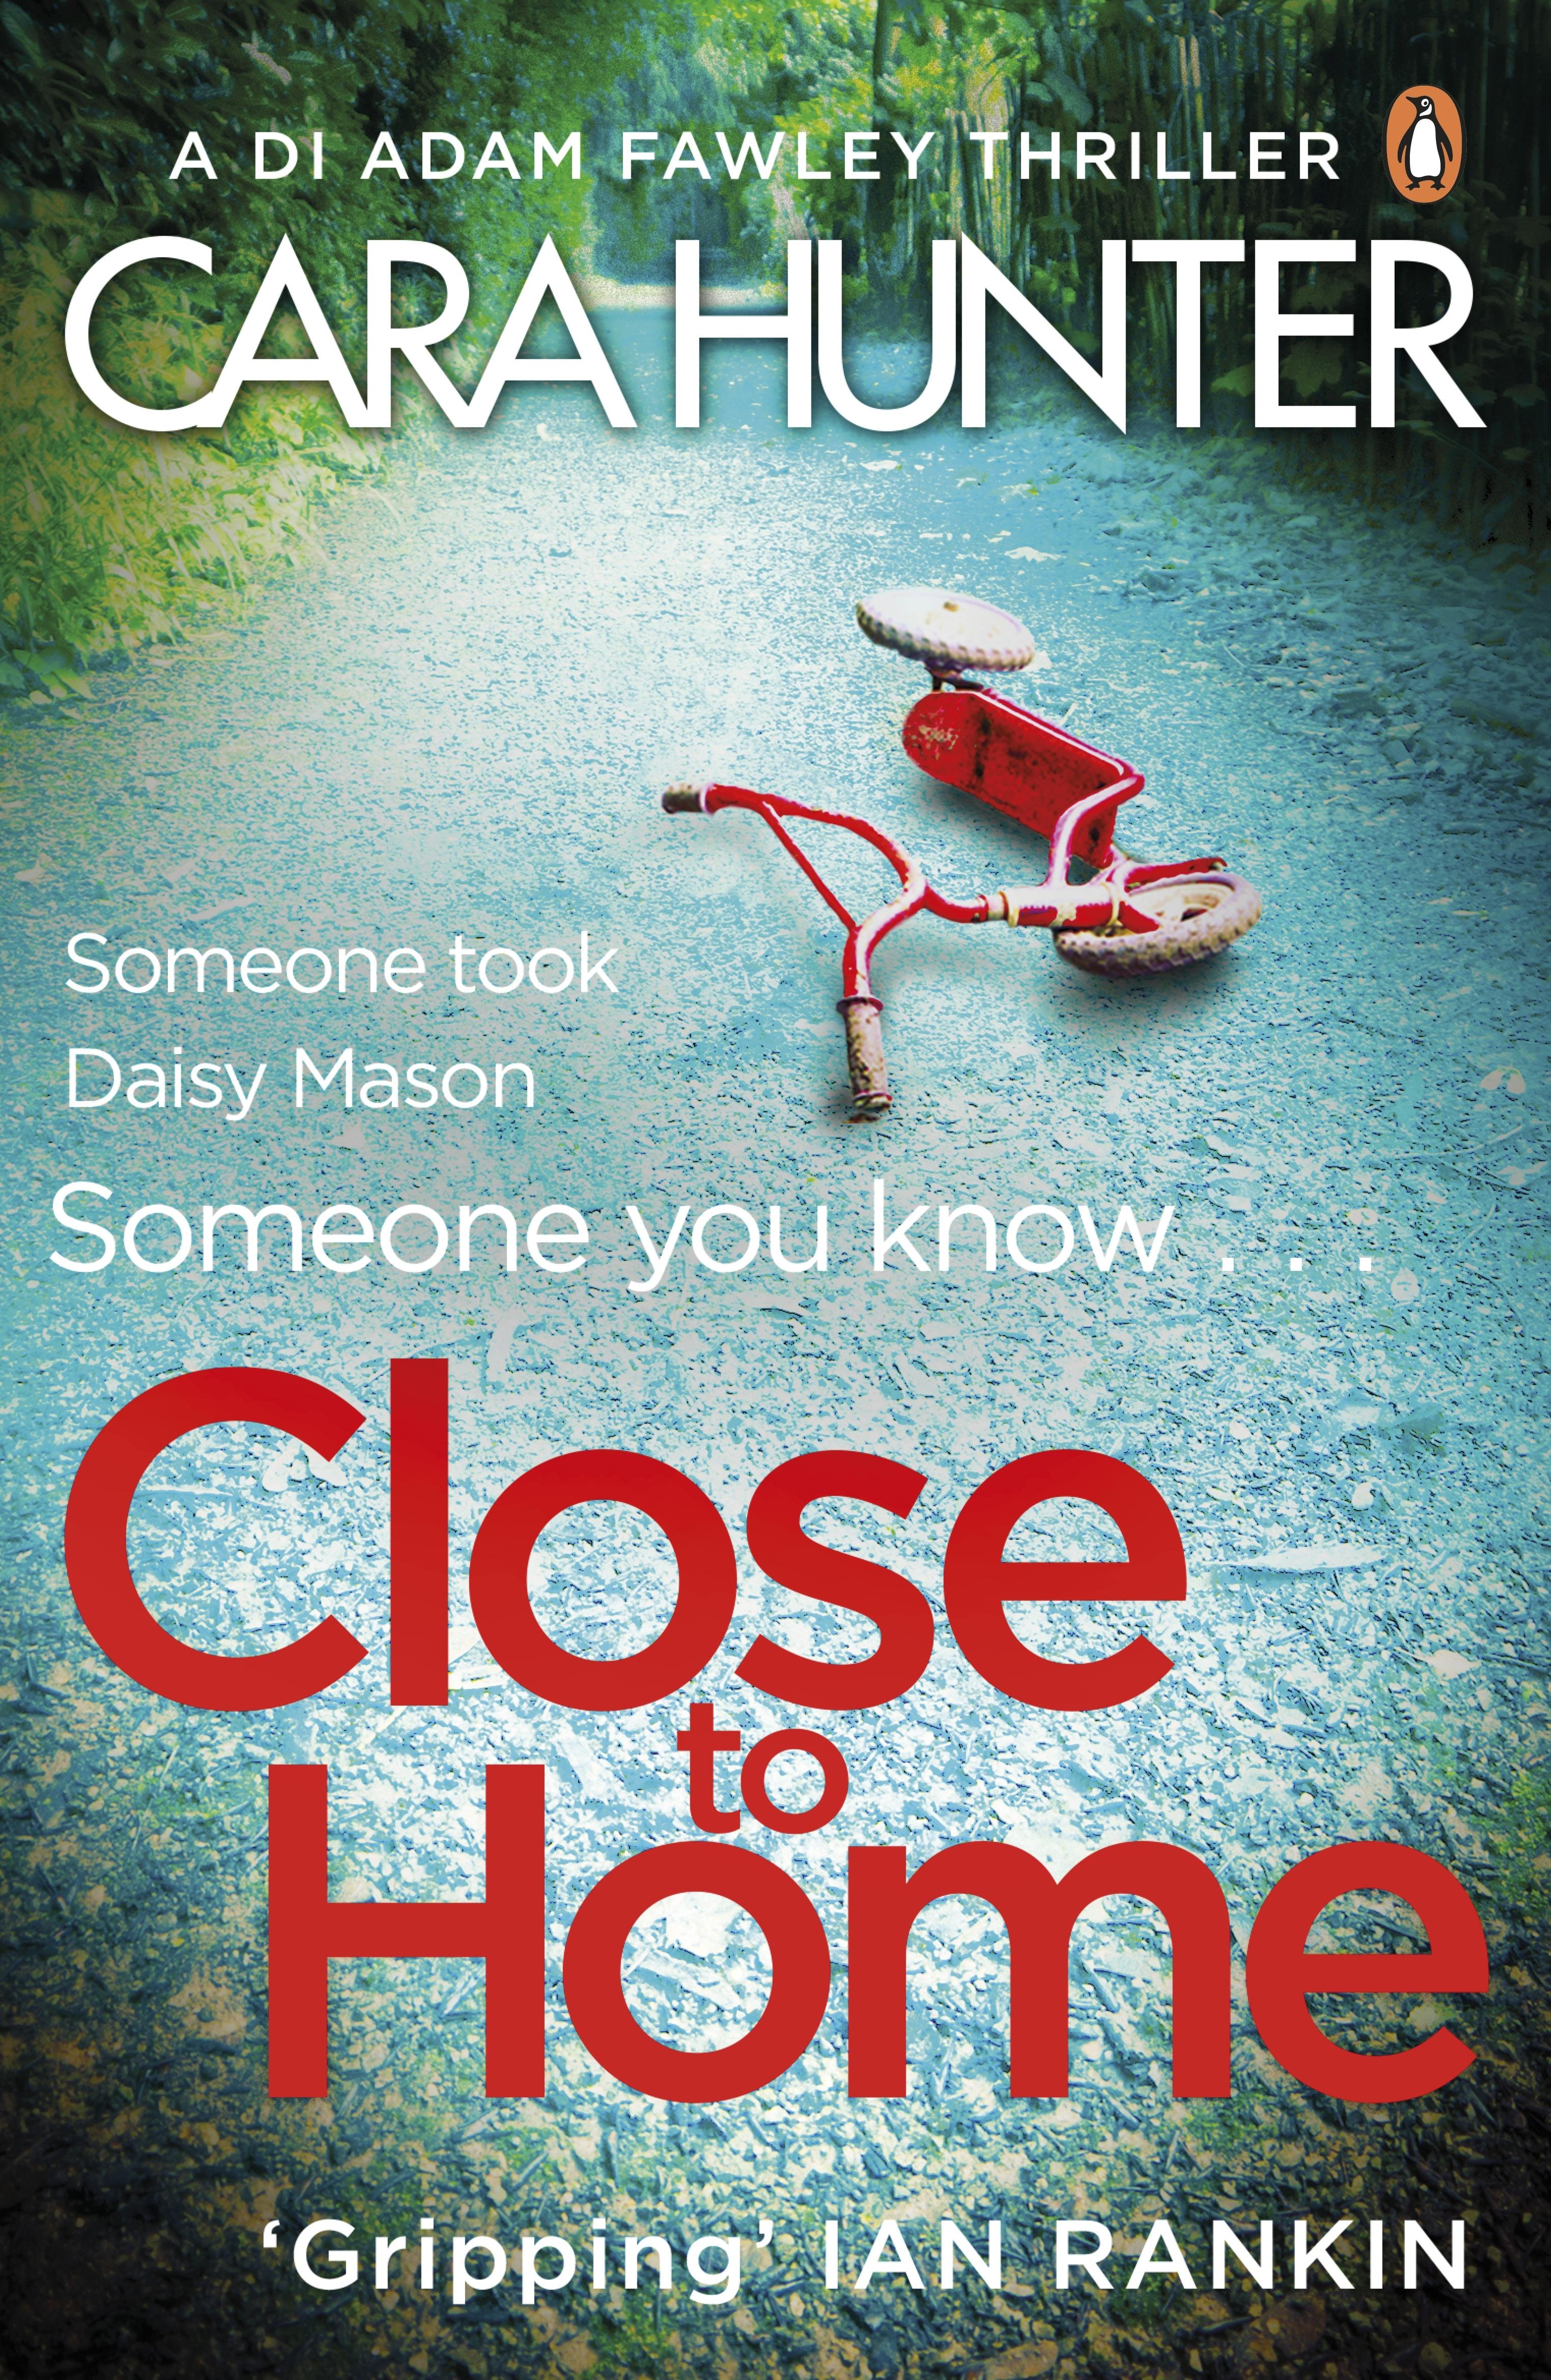 Close to Home by Cara Hunter - Penguin Books Australia